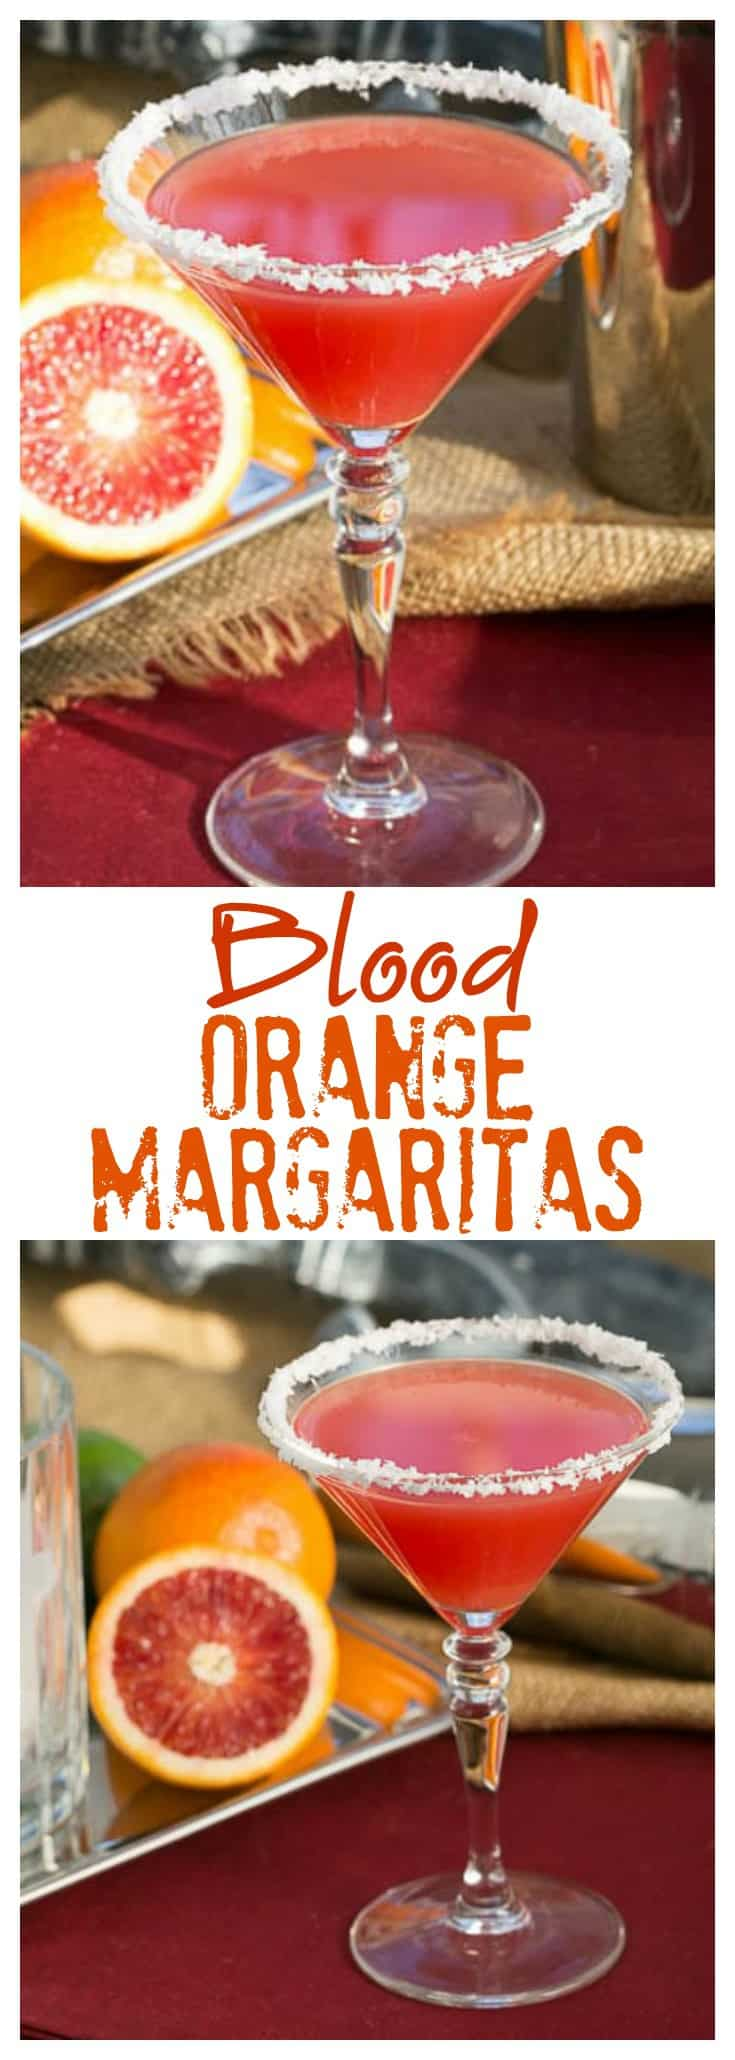 Blood Orange Margaritas - An elegant, vibrant cocktail